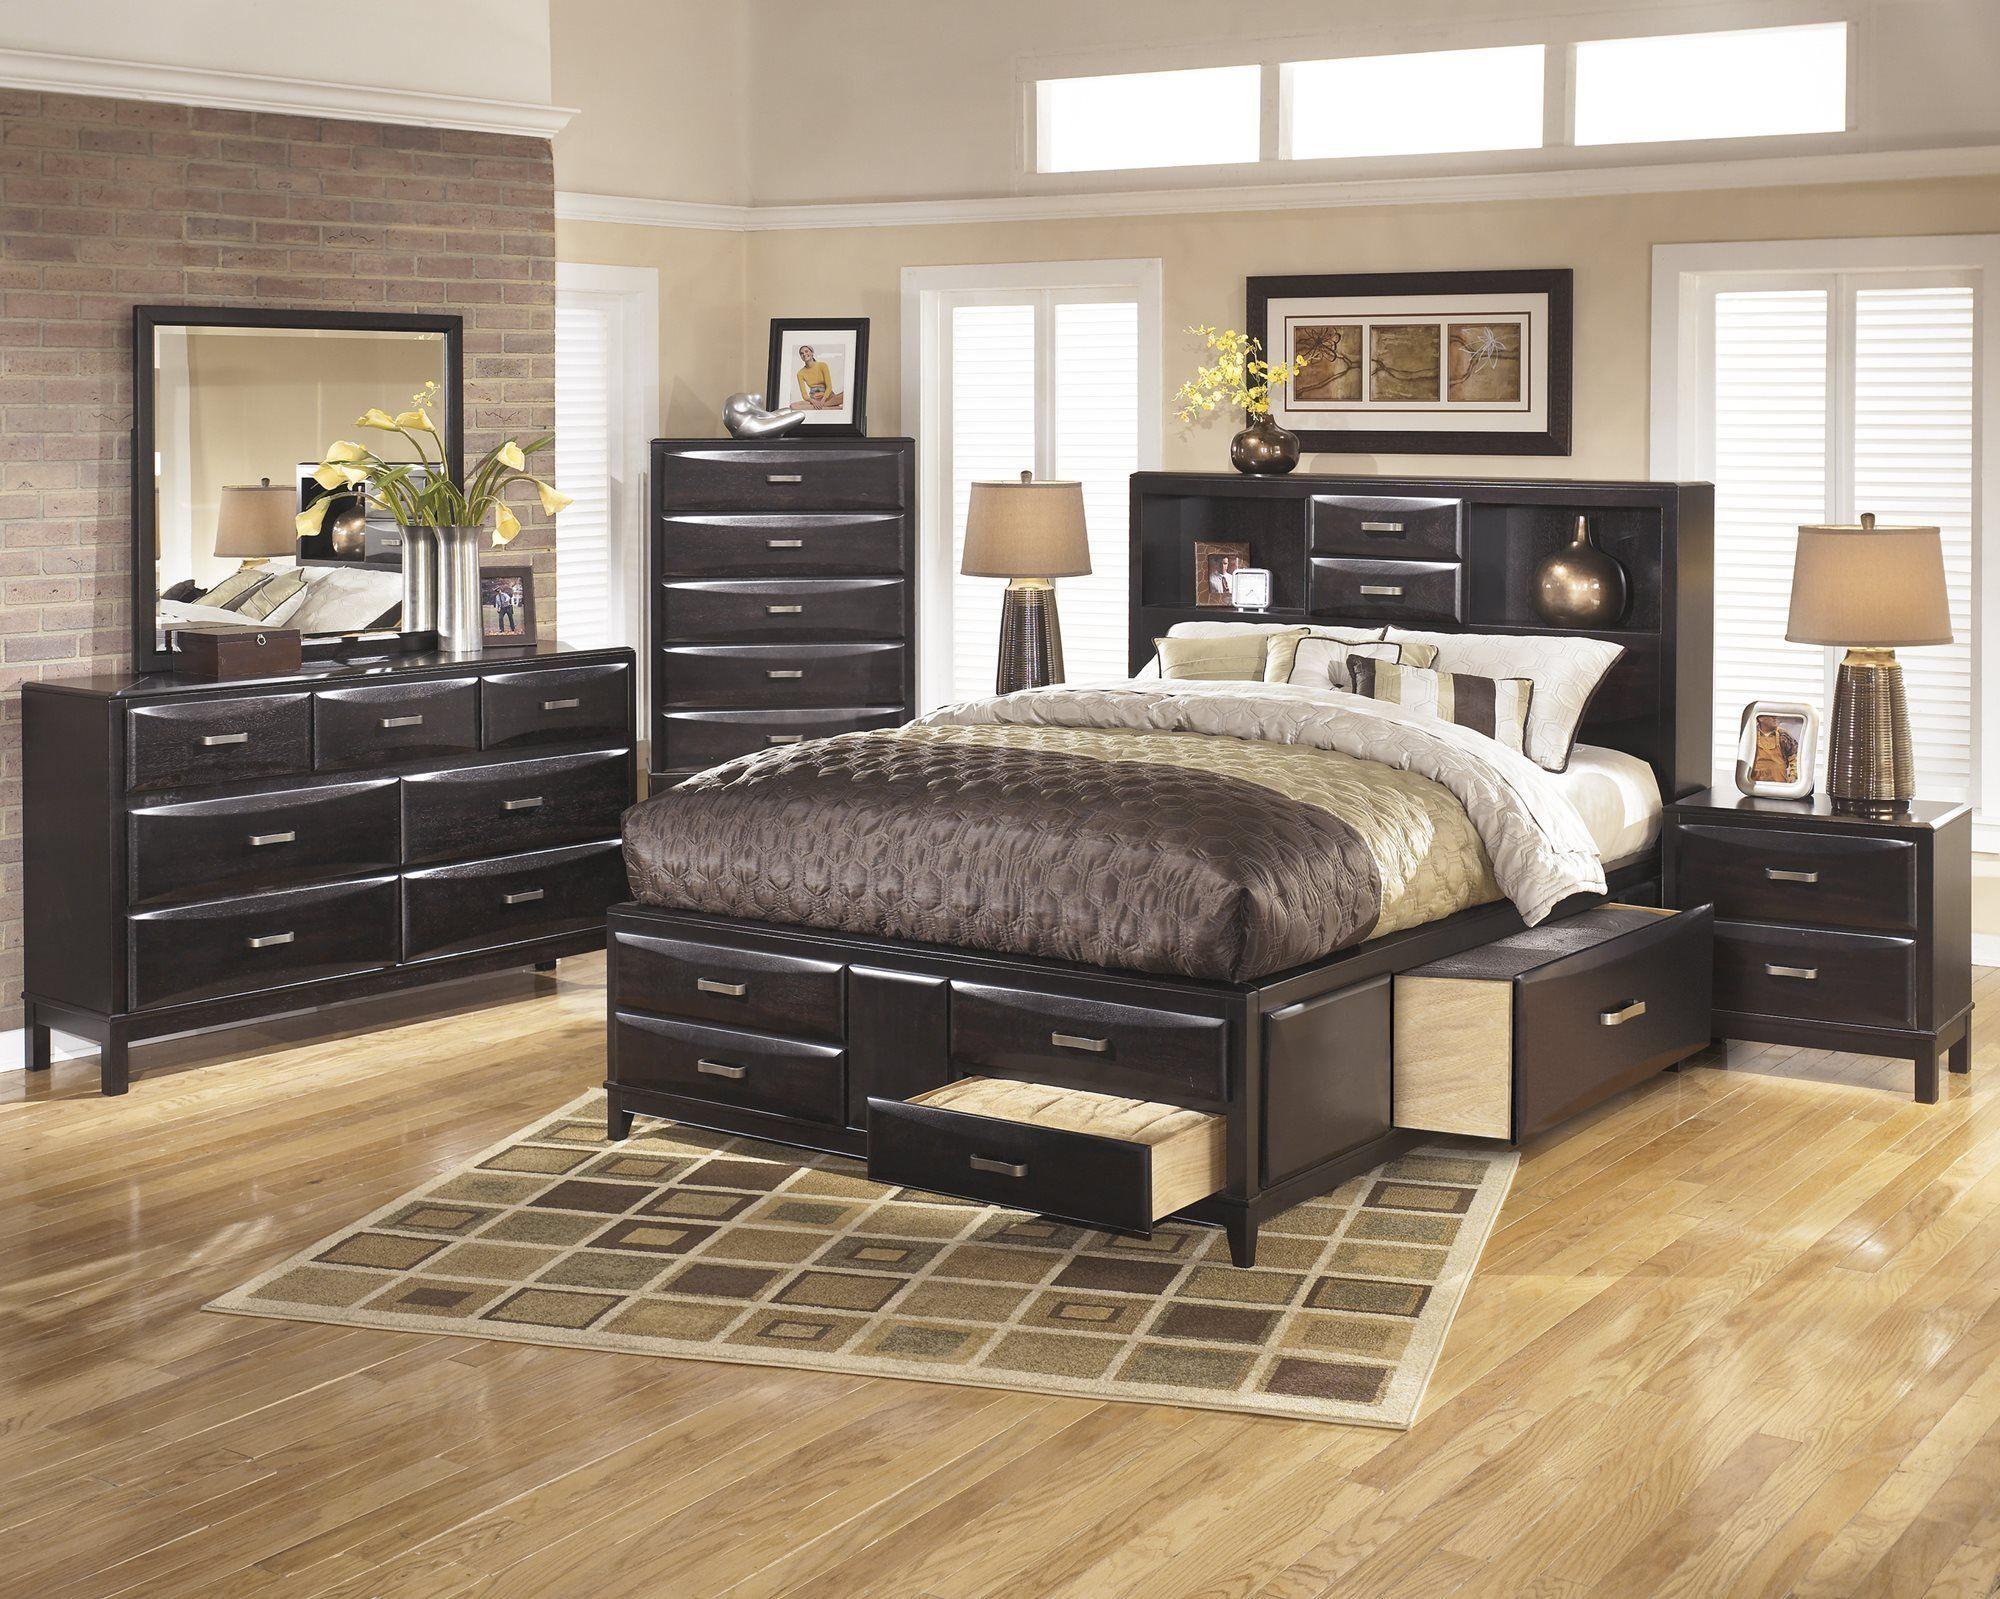 Ashley Kira 5pc Bedroom Set E King Storage Bed Dresser Mirror Two